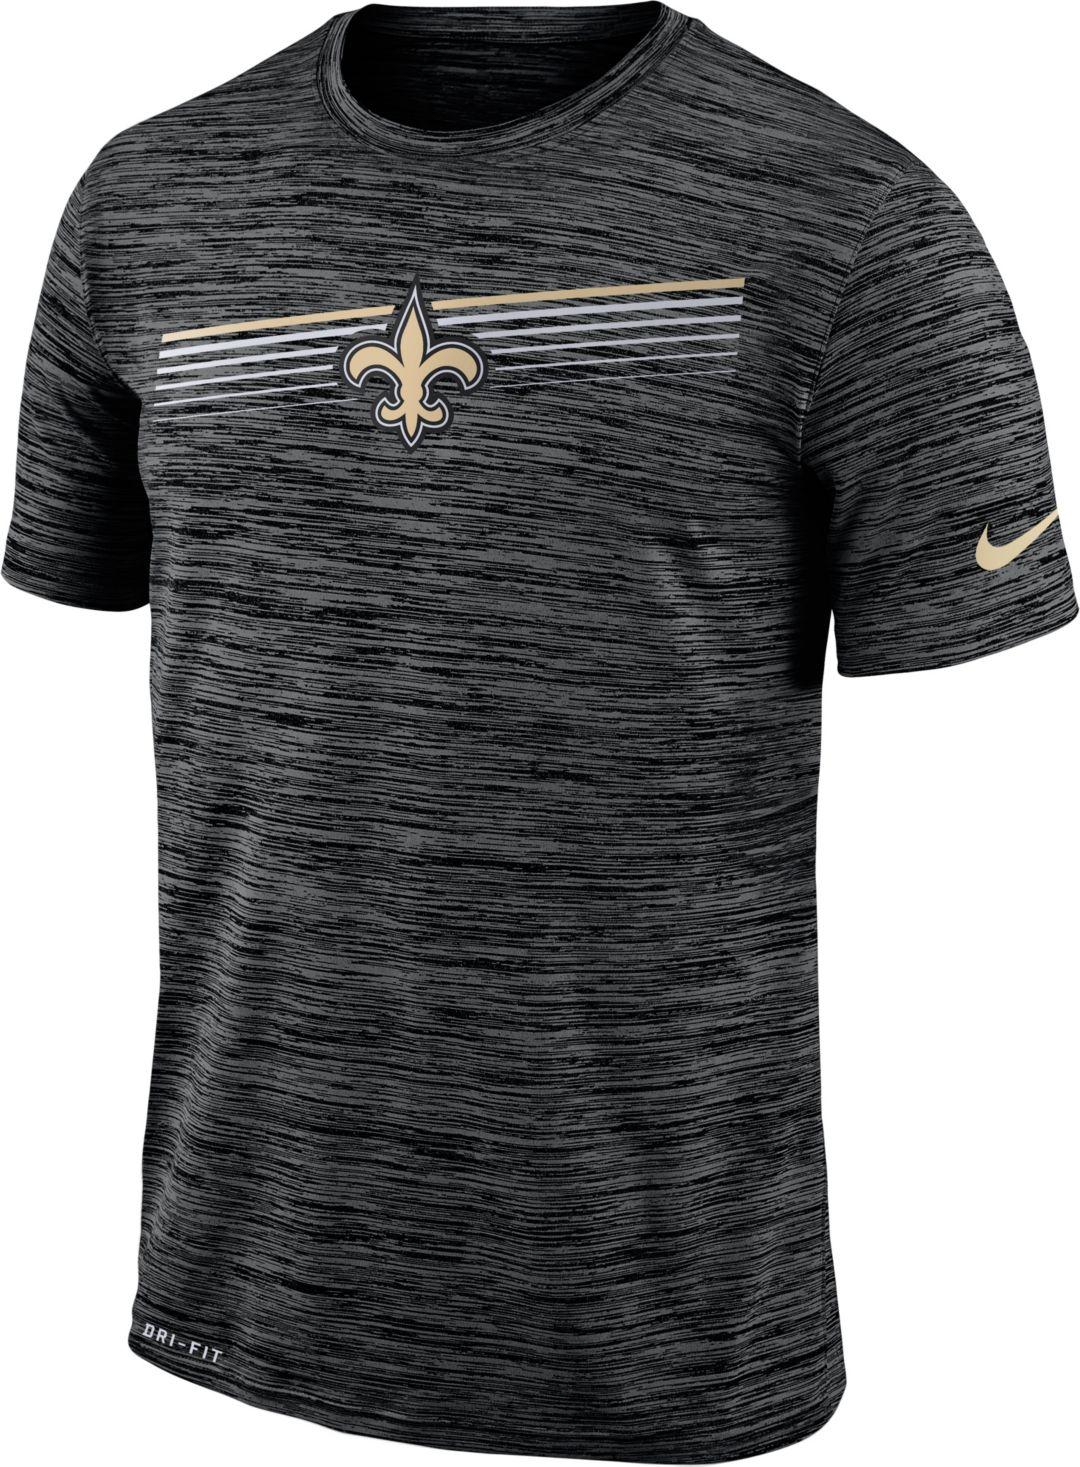 ebf38221 Nike Men's New Orleans Saints Sideline Legend Velocity Black T-Shirt